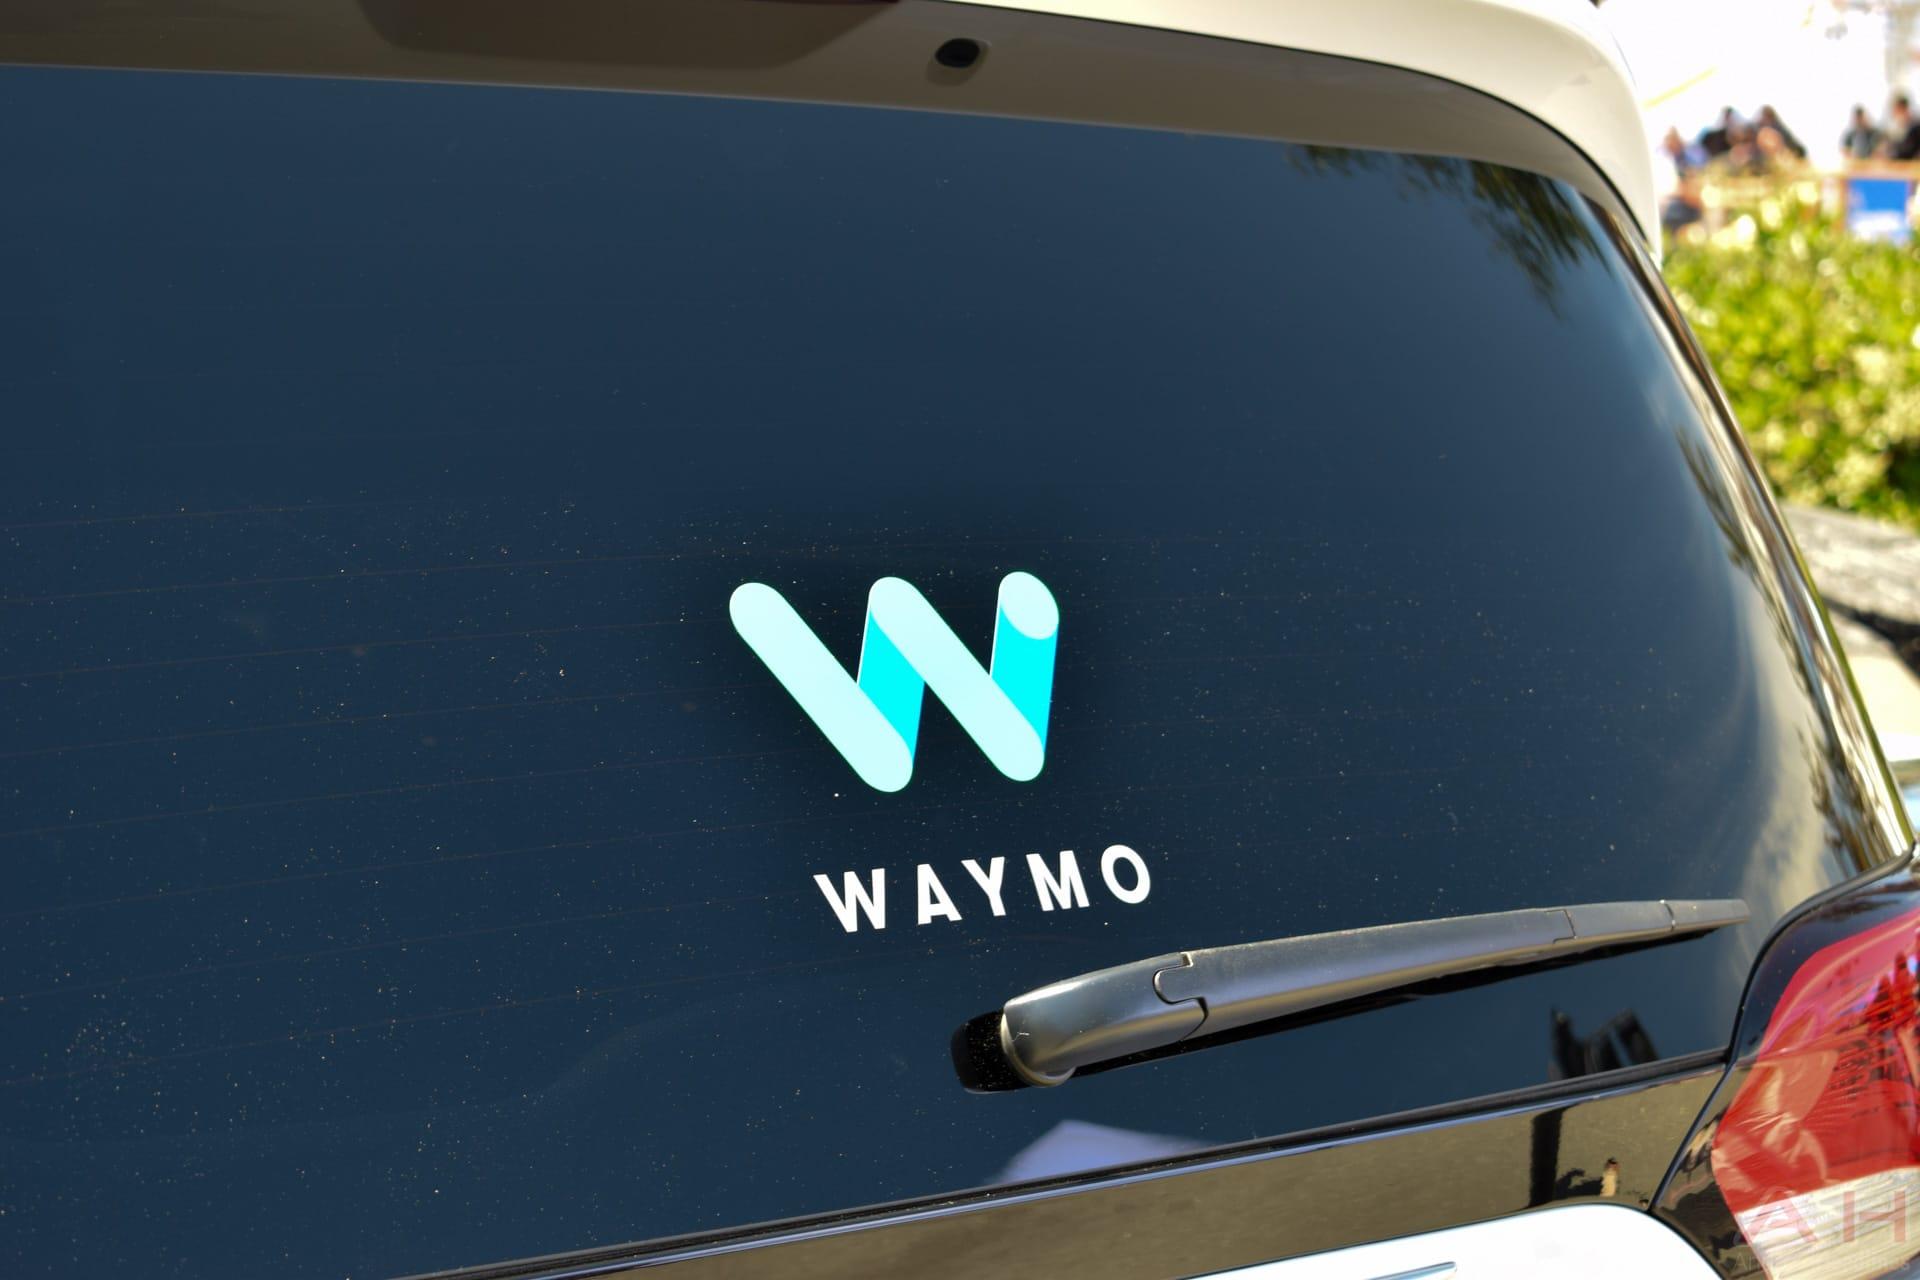 Waymo Autonomous Vehicles Hit Eight Million Miles Traveled